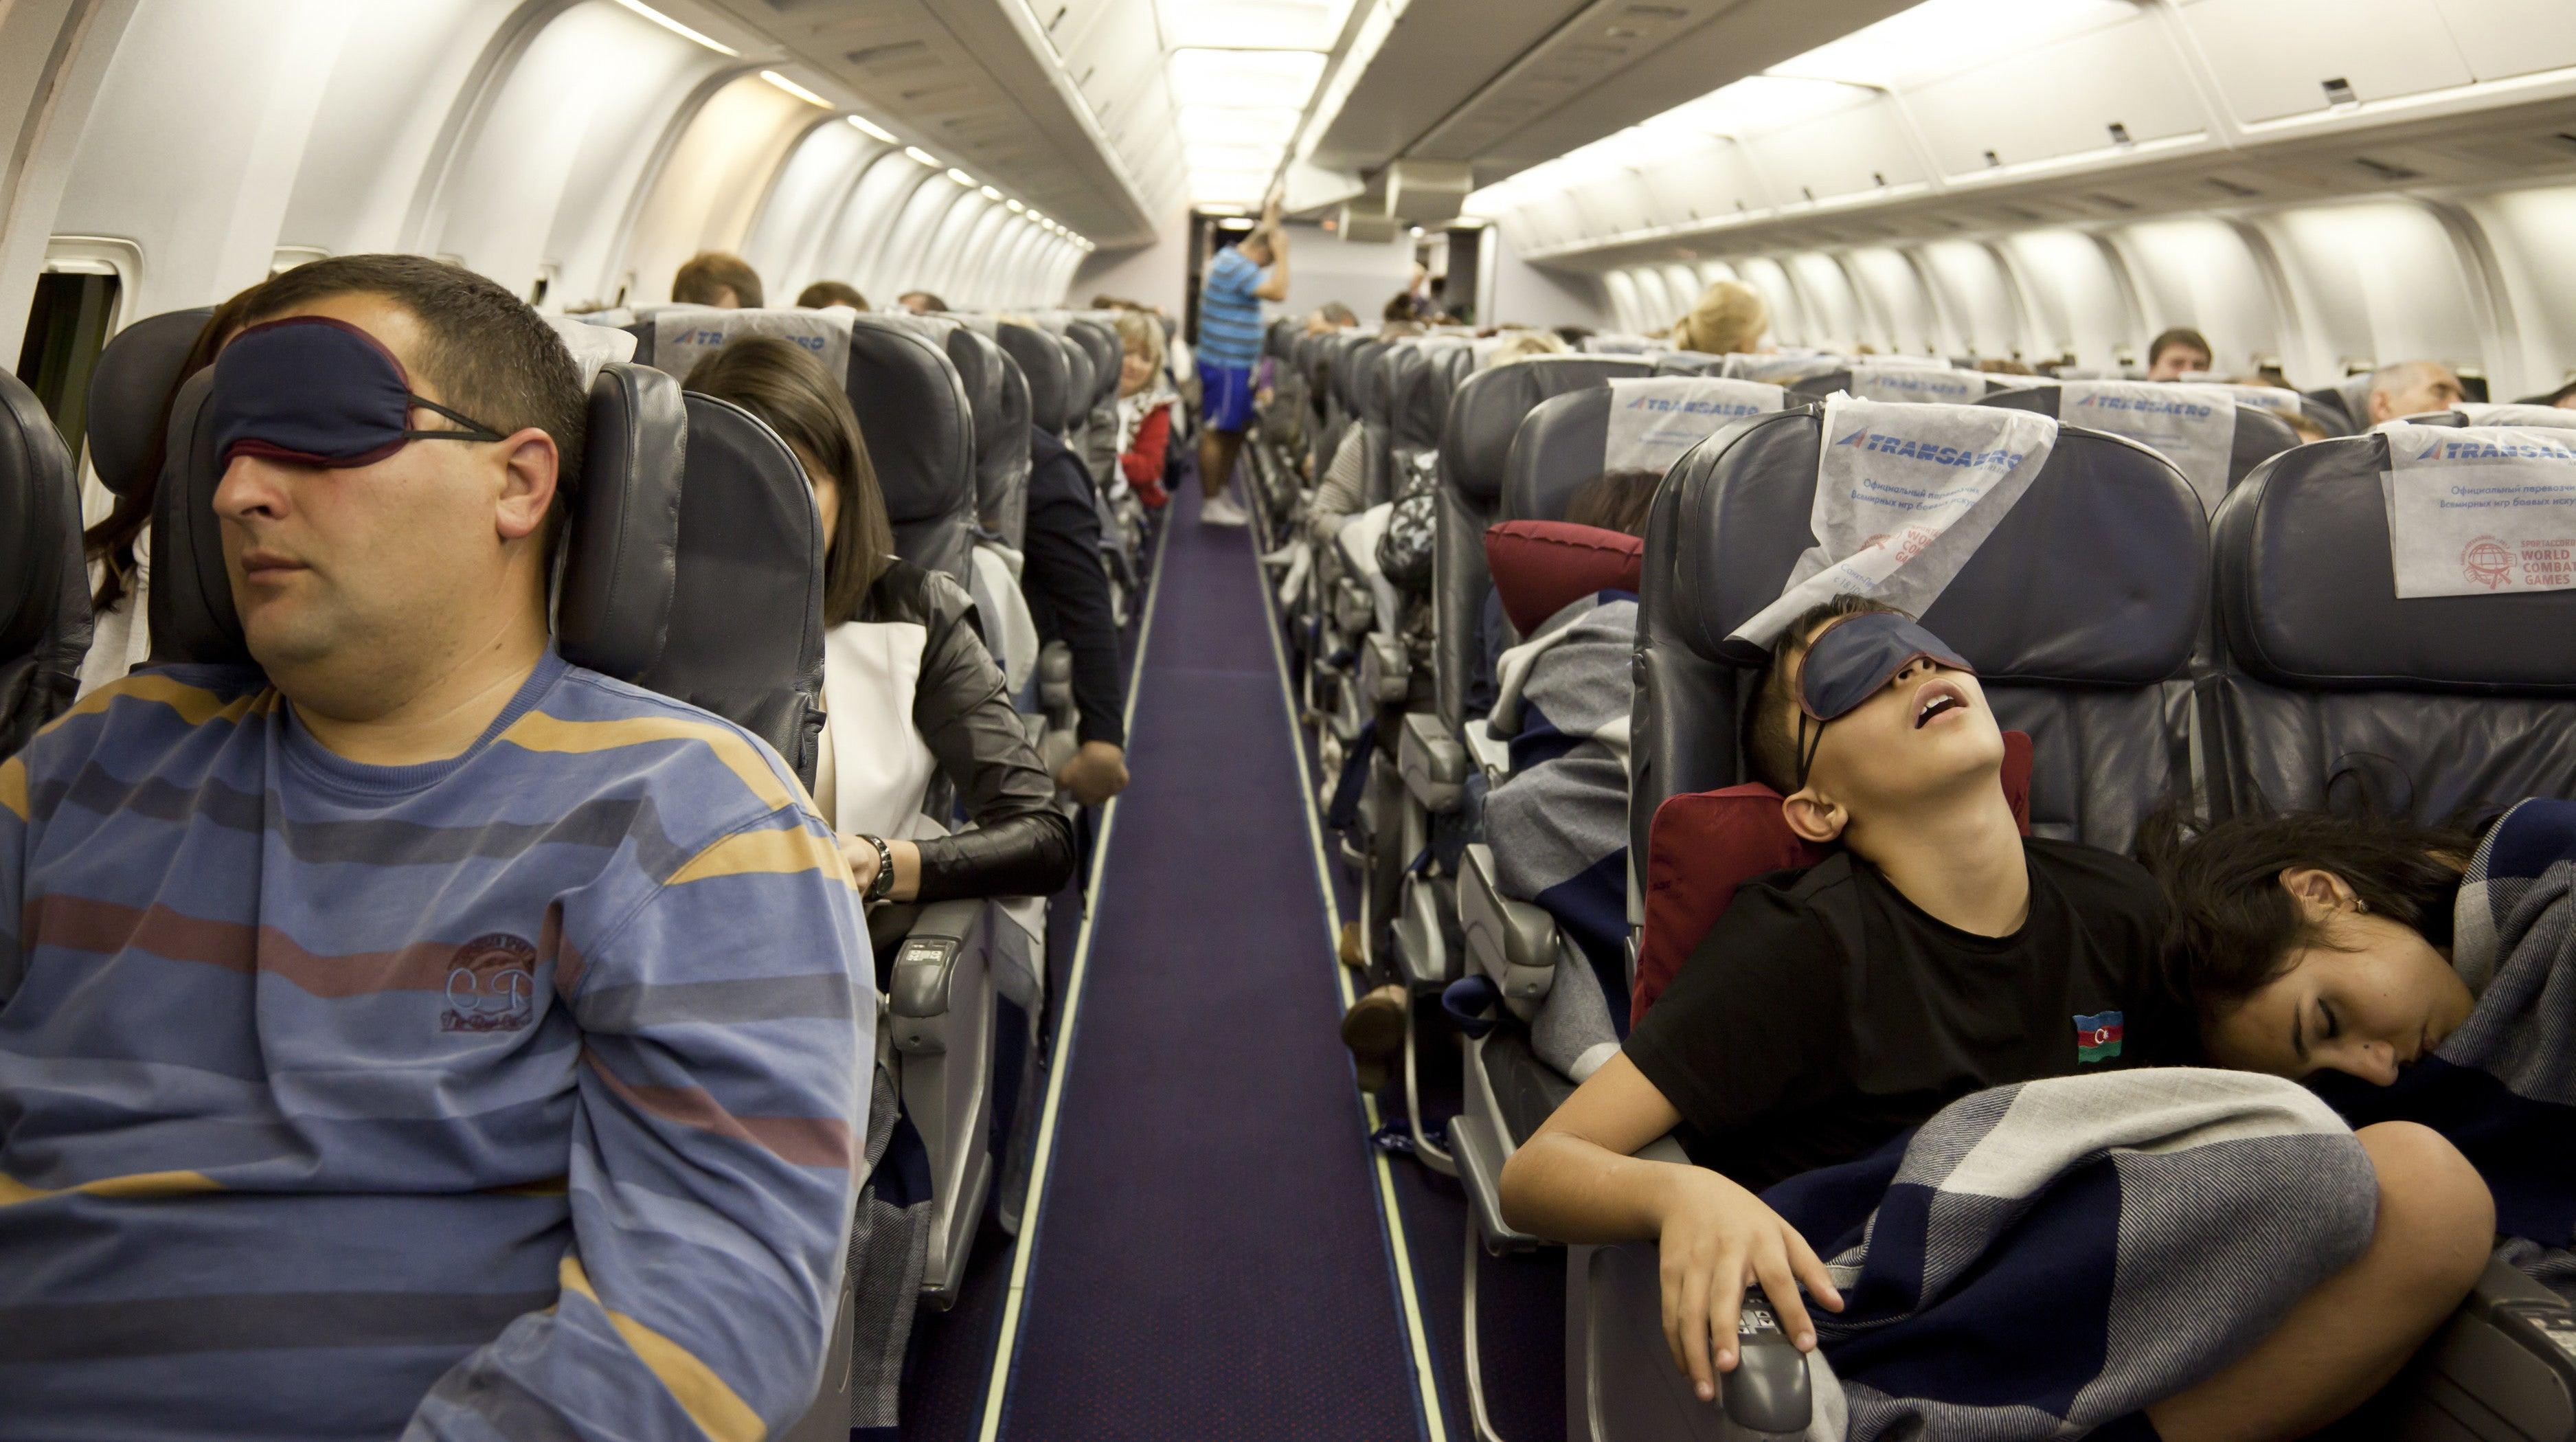 The Best Ways To Sleep On Economy Flights